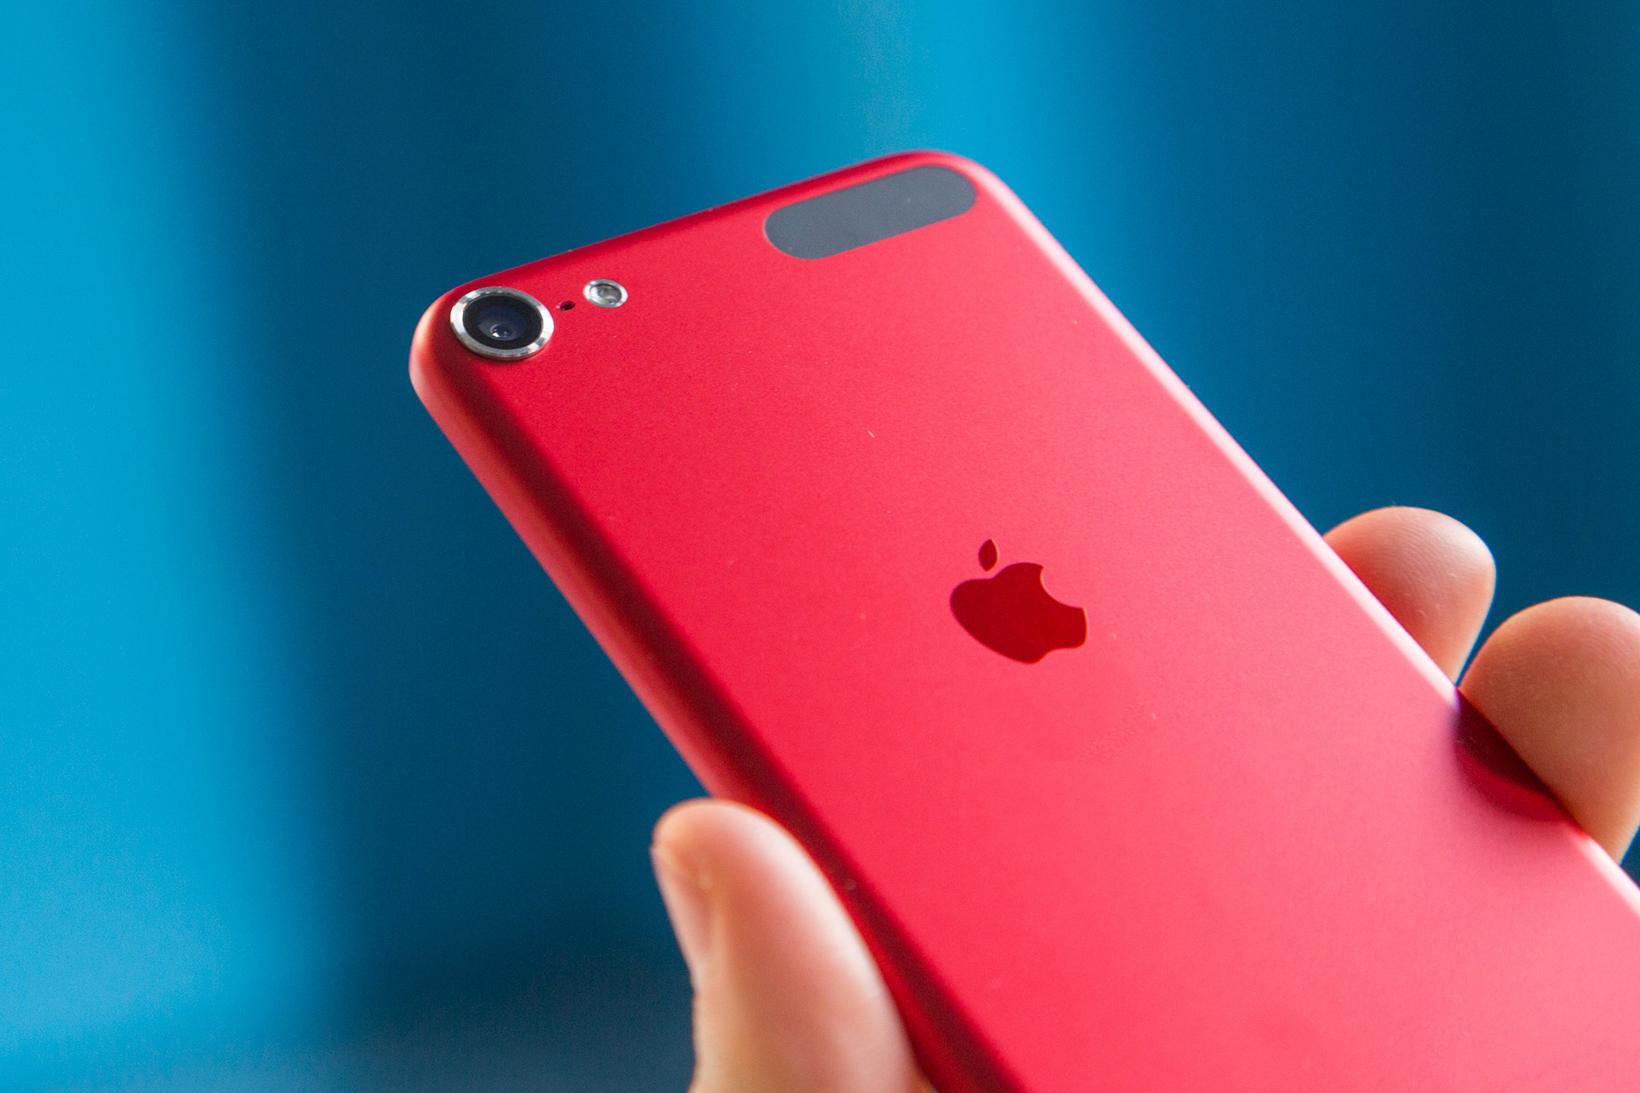 Apple iPhone Red iPhone 7s iPhone 7s Plus - 1817110